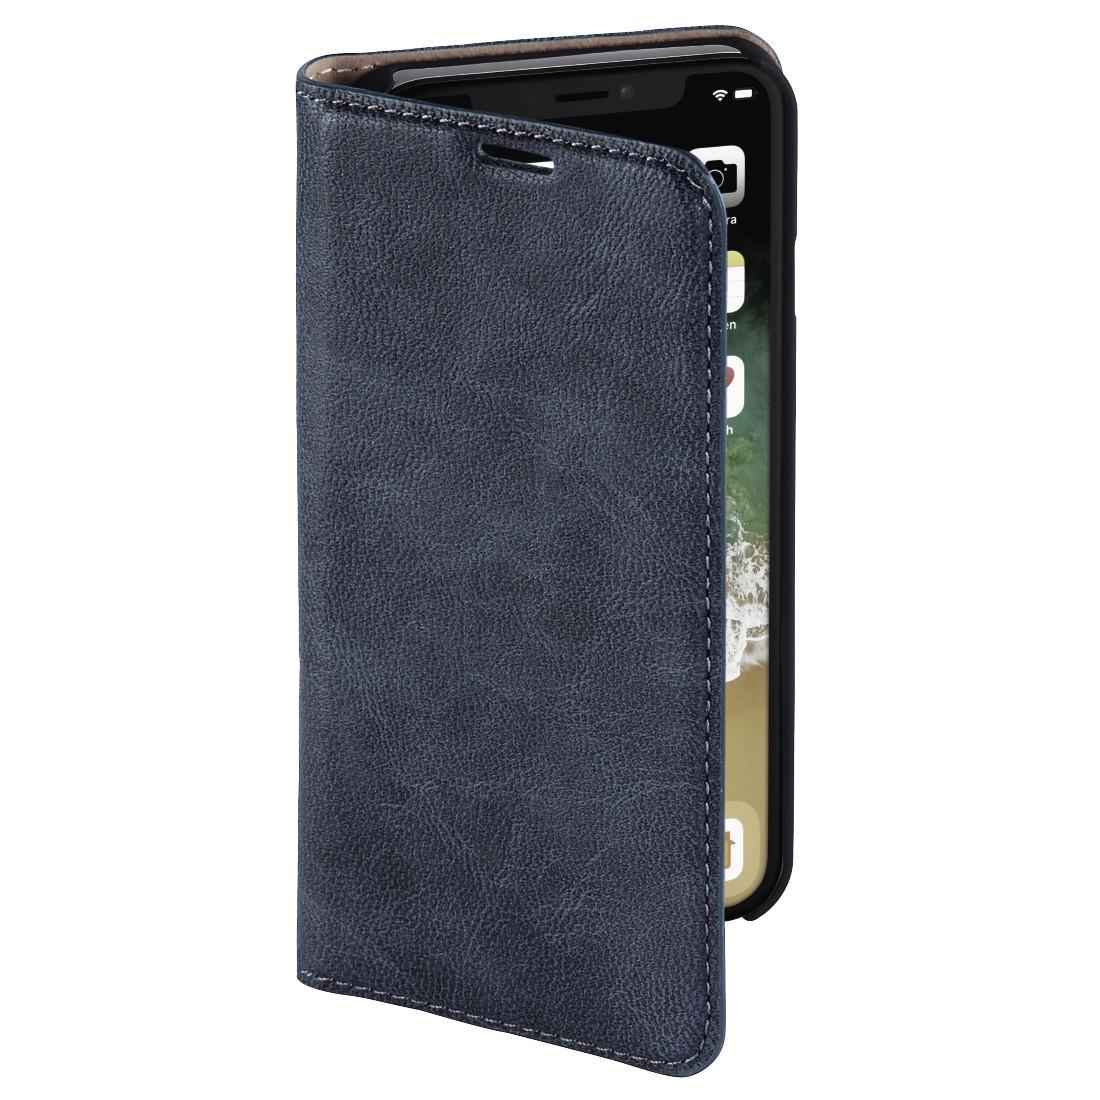 Hama telefoonhoesje Booklet guard Iphone XR blauw